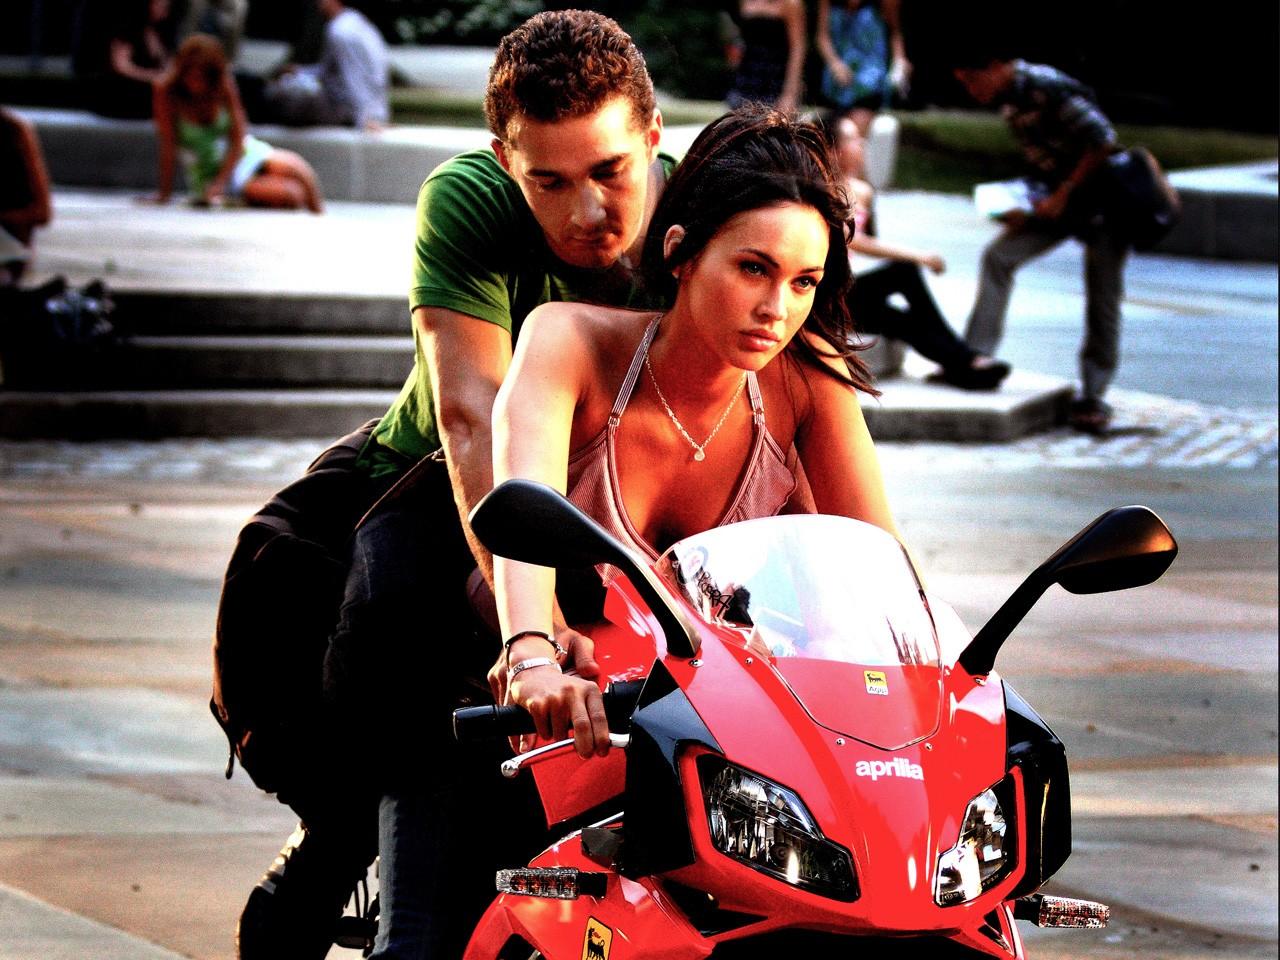 Car Motorcycle Vehicle Transformers Megan Fox Revenge Of The Fallen Auto Show